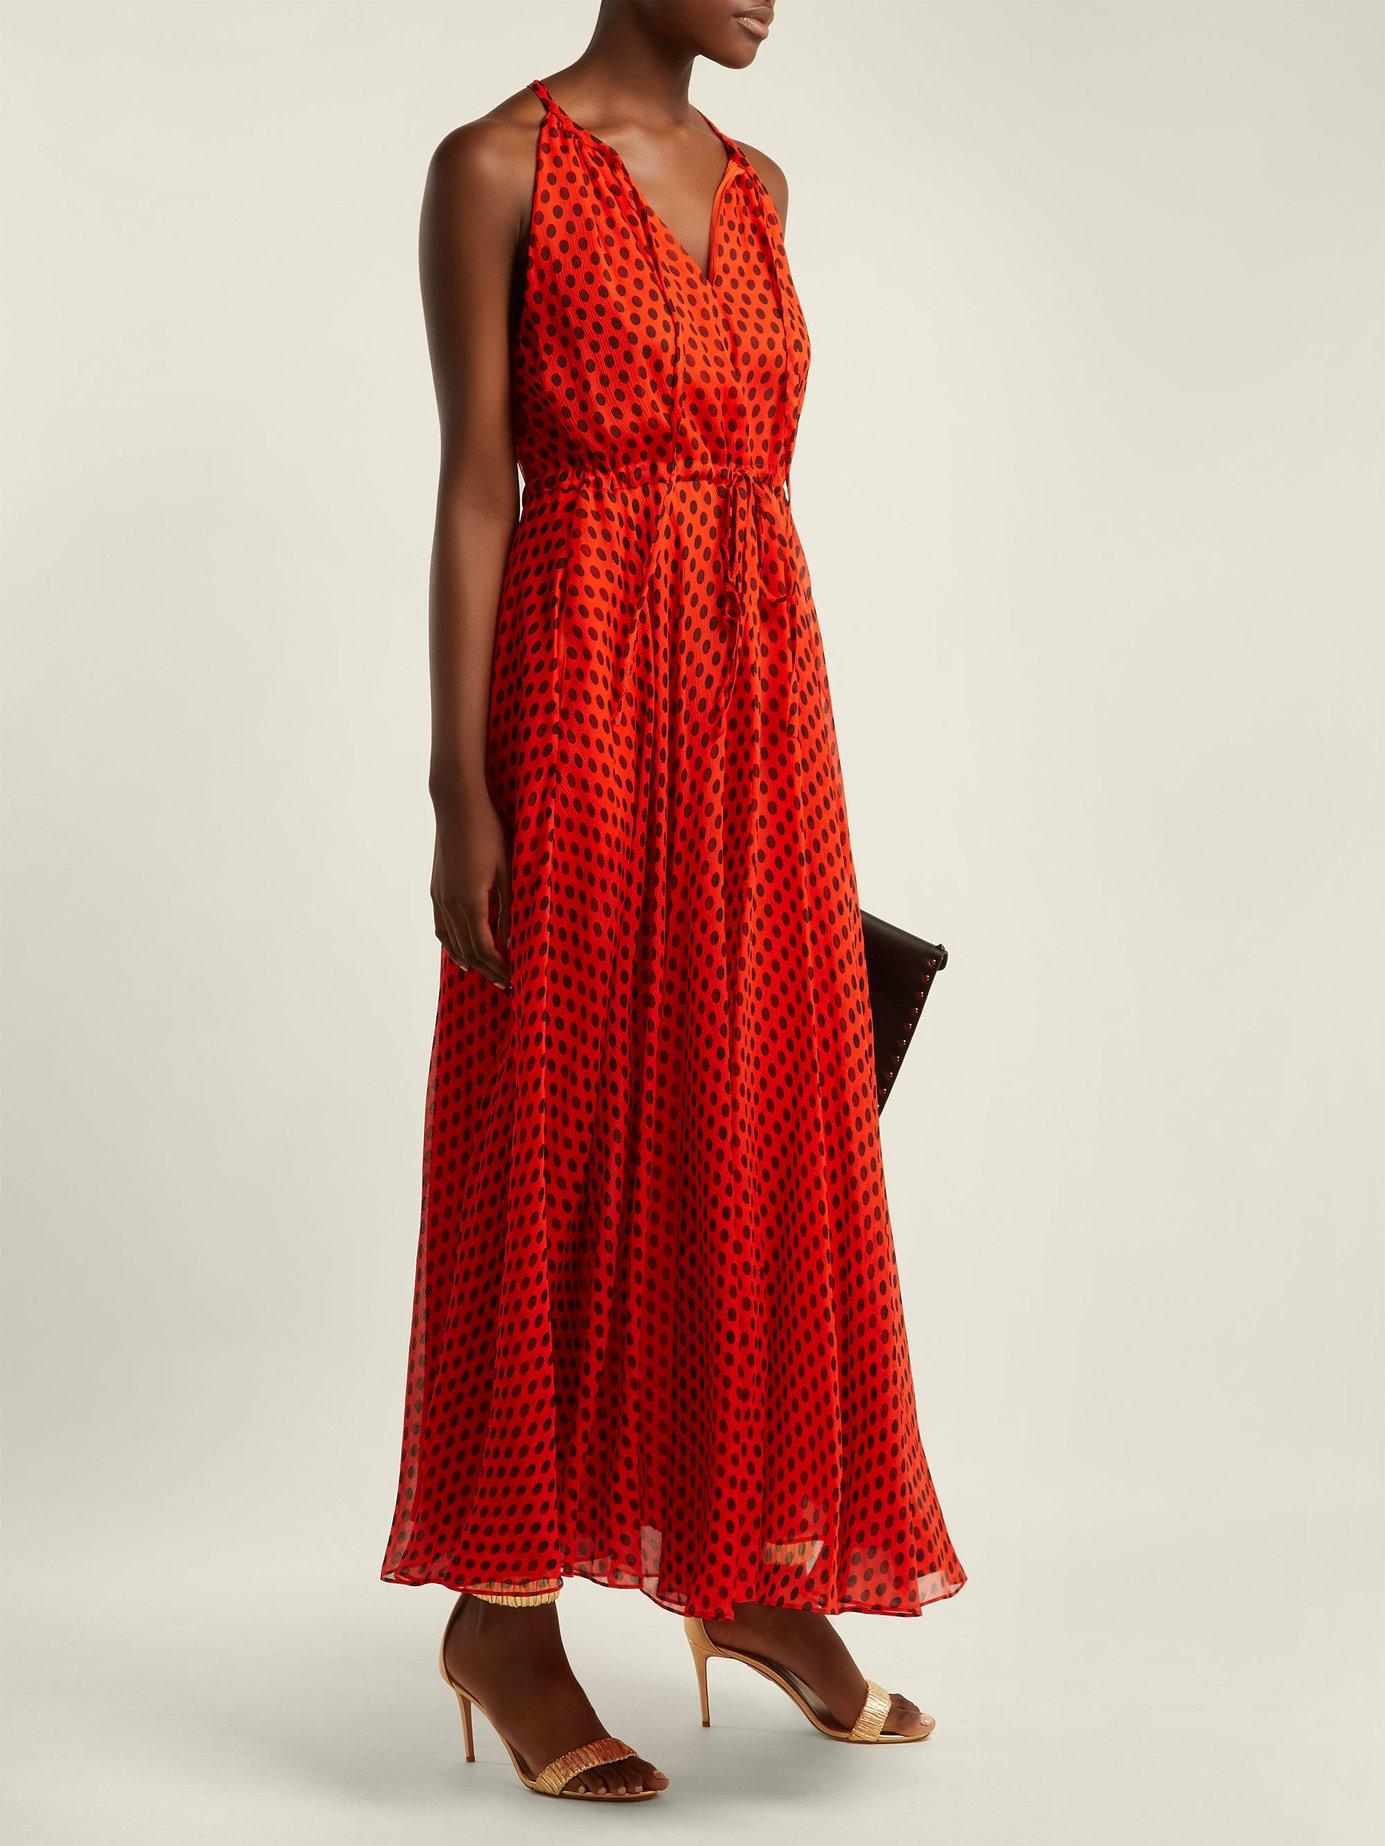 Baker polka-dot silk-crepe dress by Diane Von Furstenberg